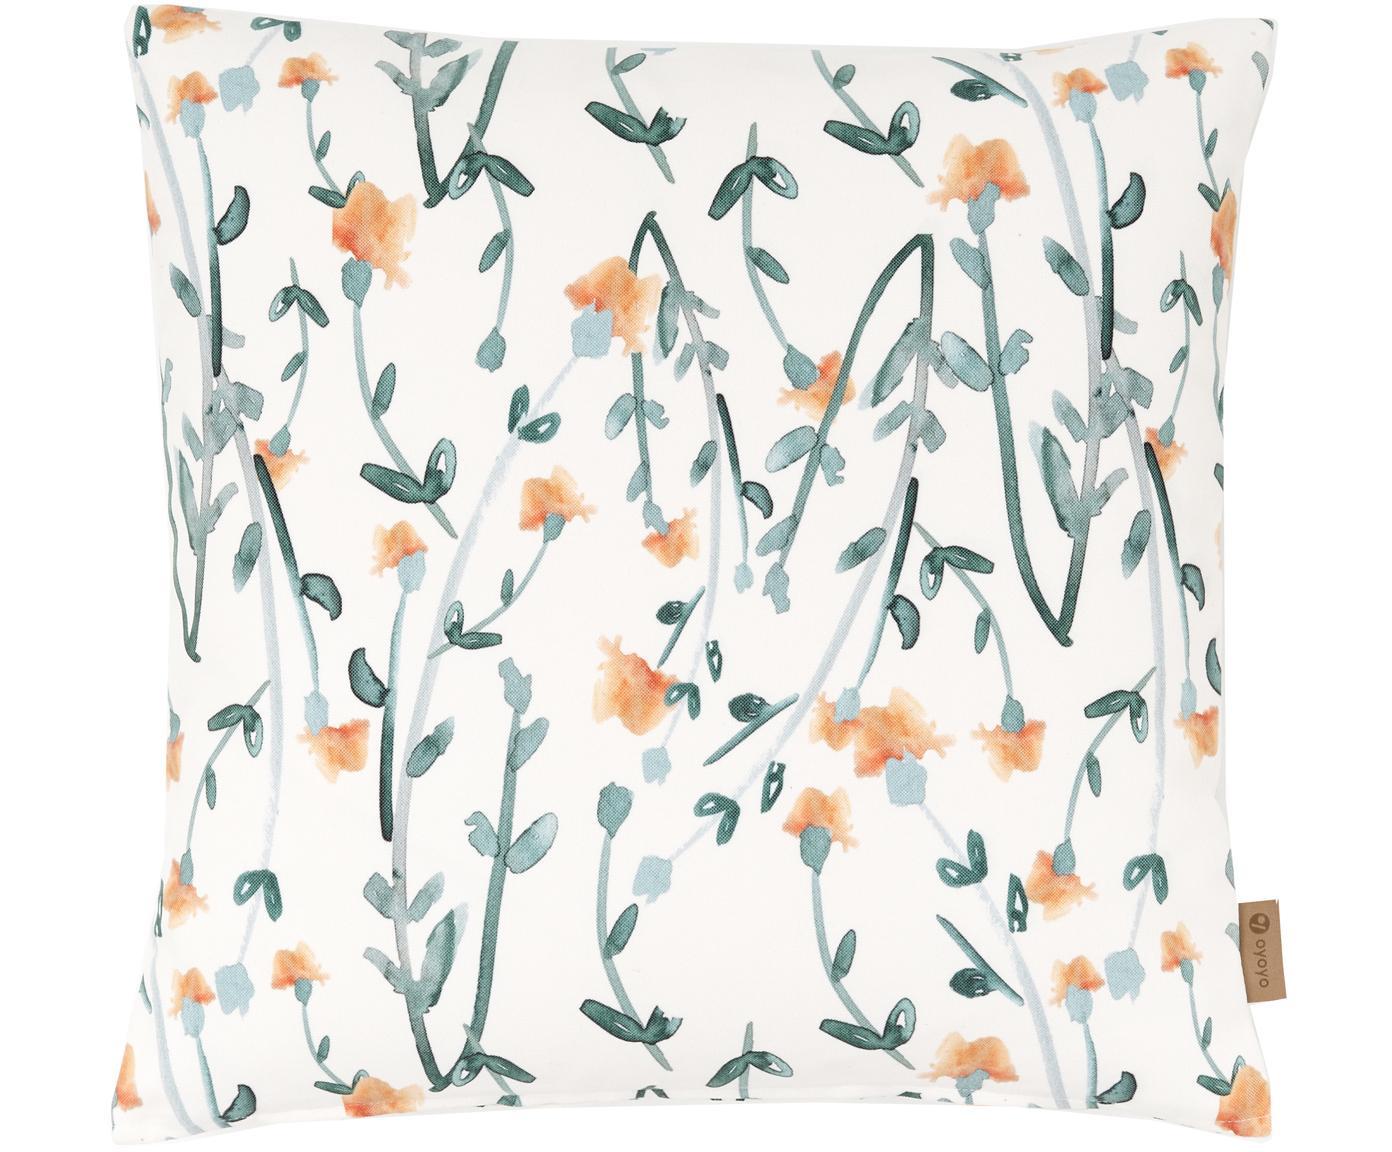 Funda de cojín Blütentraum, Poliéster, Blanco, verde, naranja, An 50 x L 50 cm